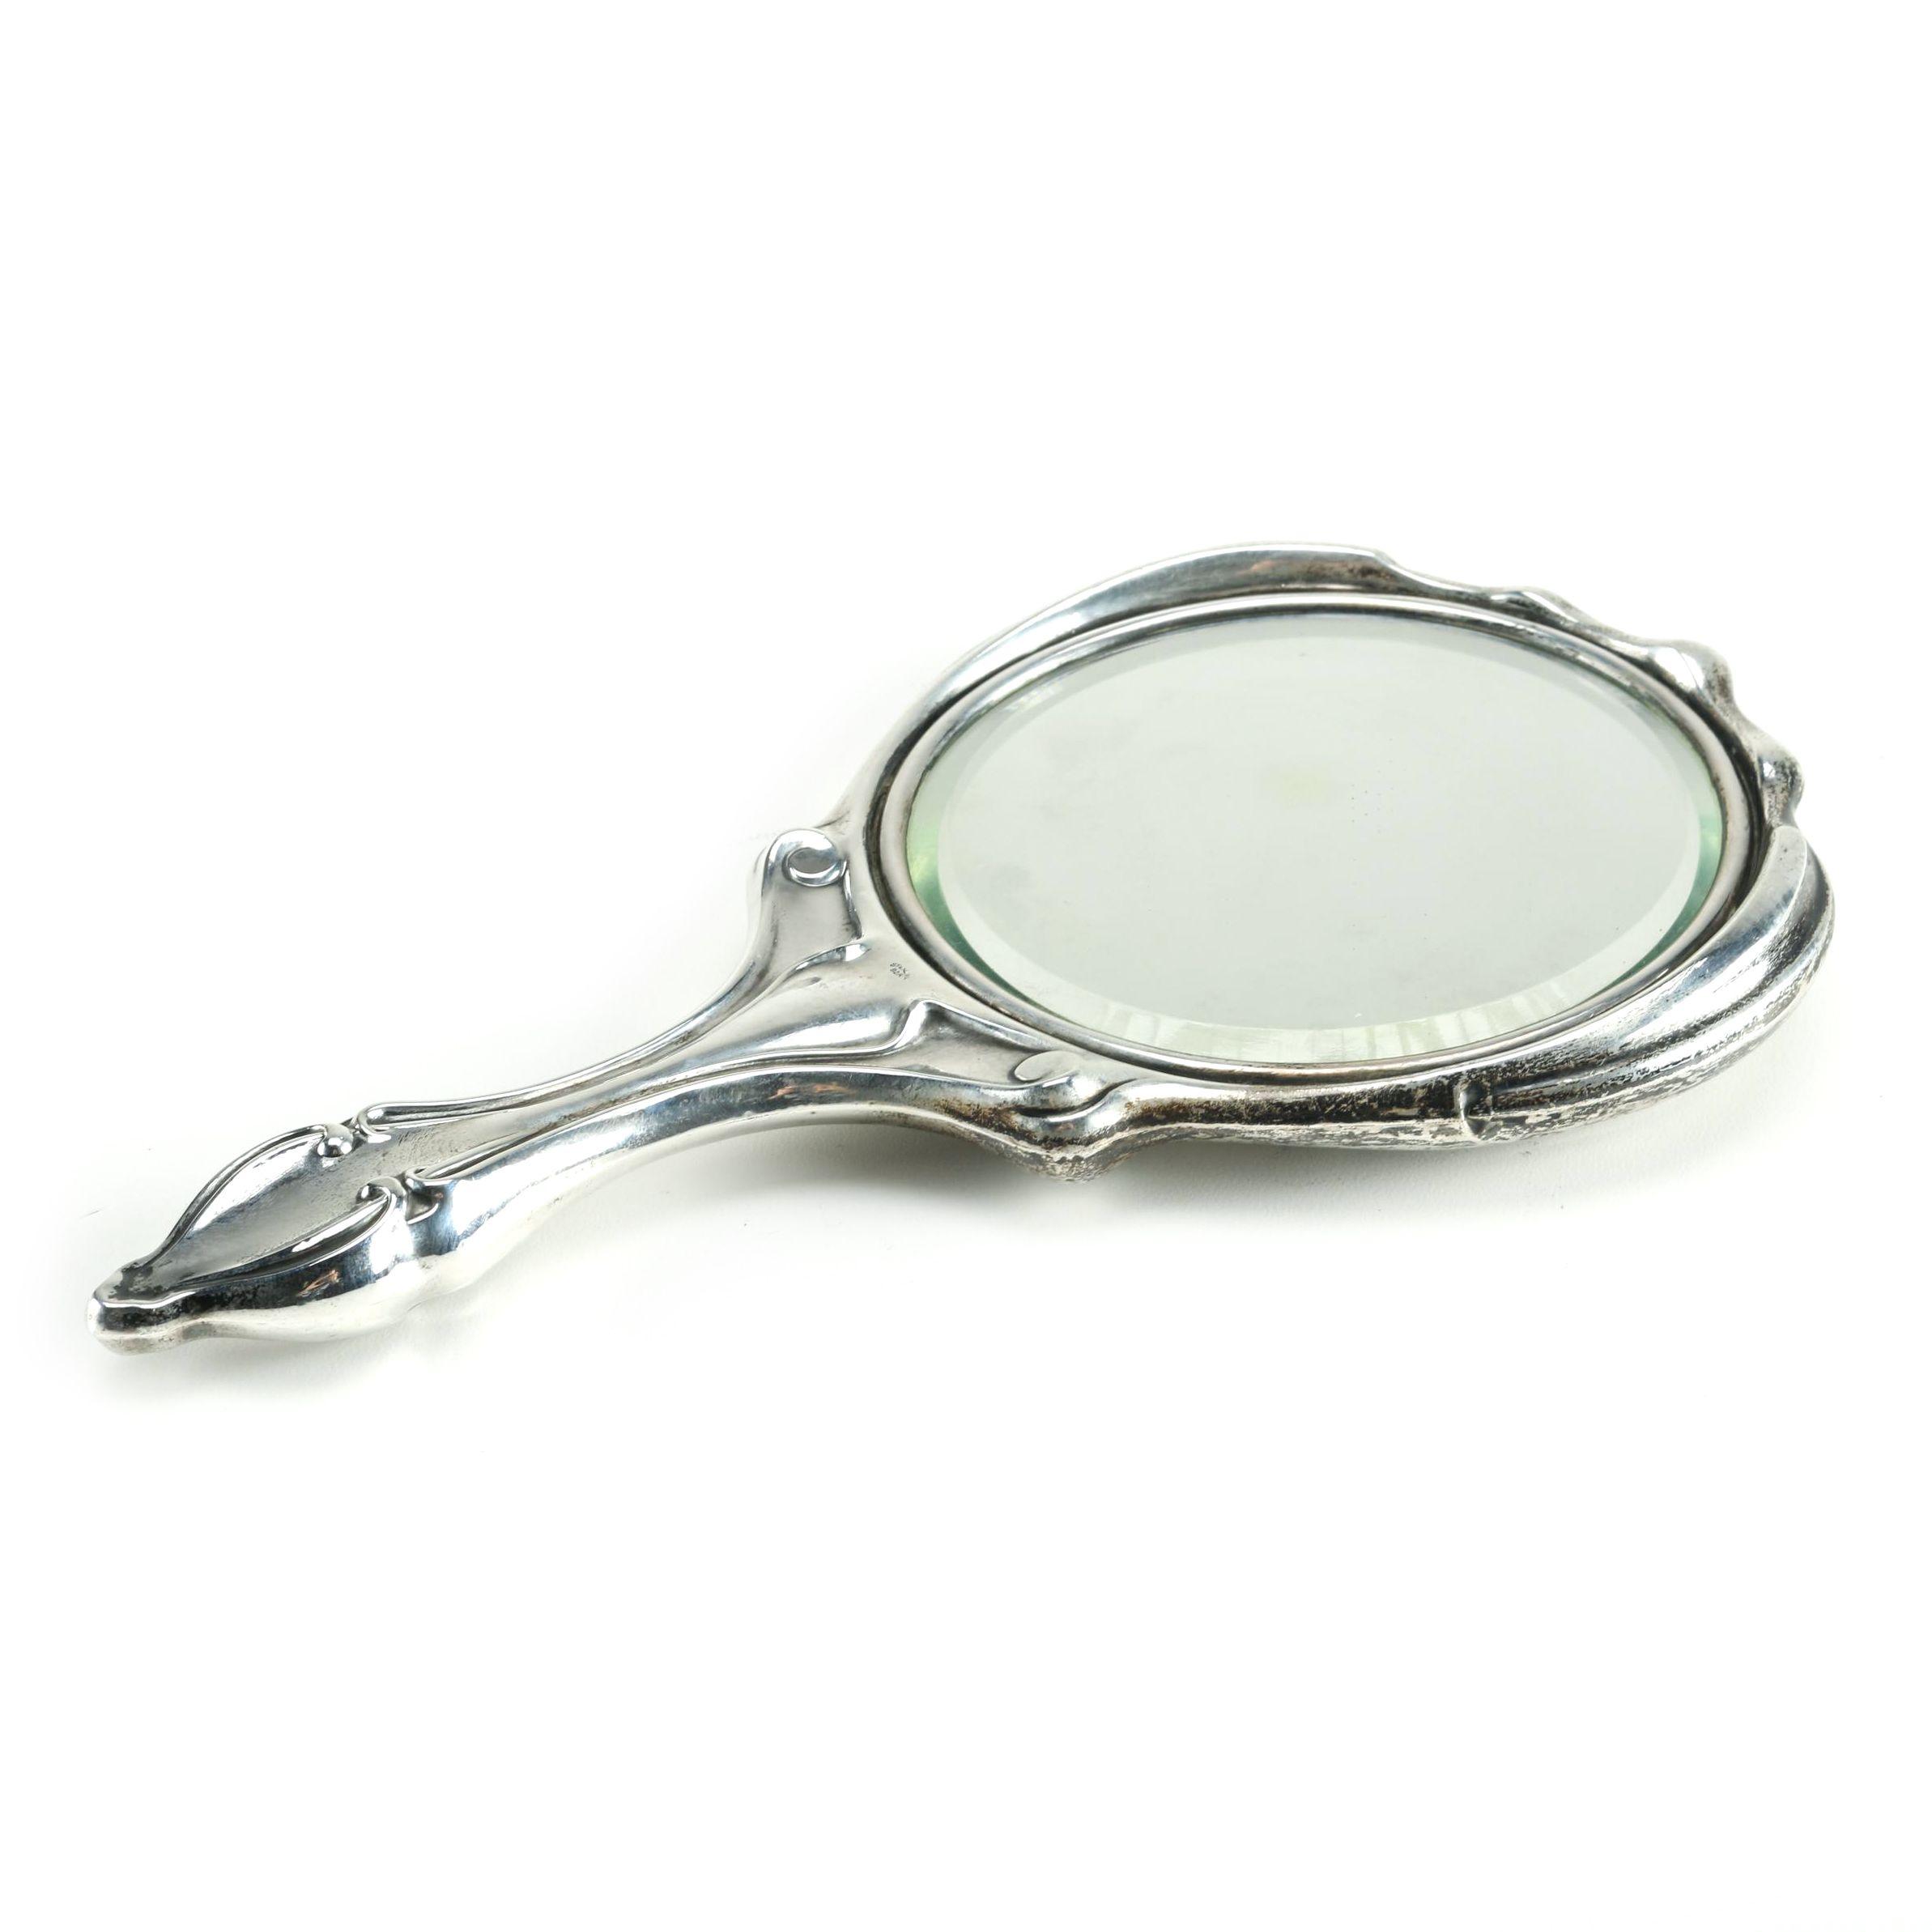 ornate hand mirror. Beveled Hand Mirror With Ornate Sterling Silver Frame Ornate Hand Mirror I